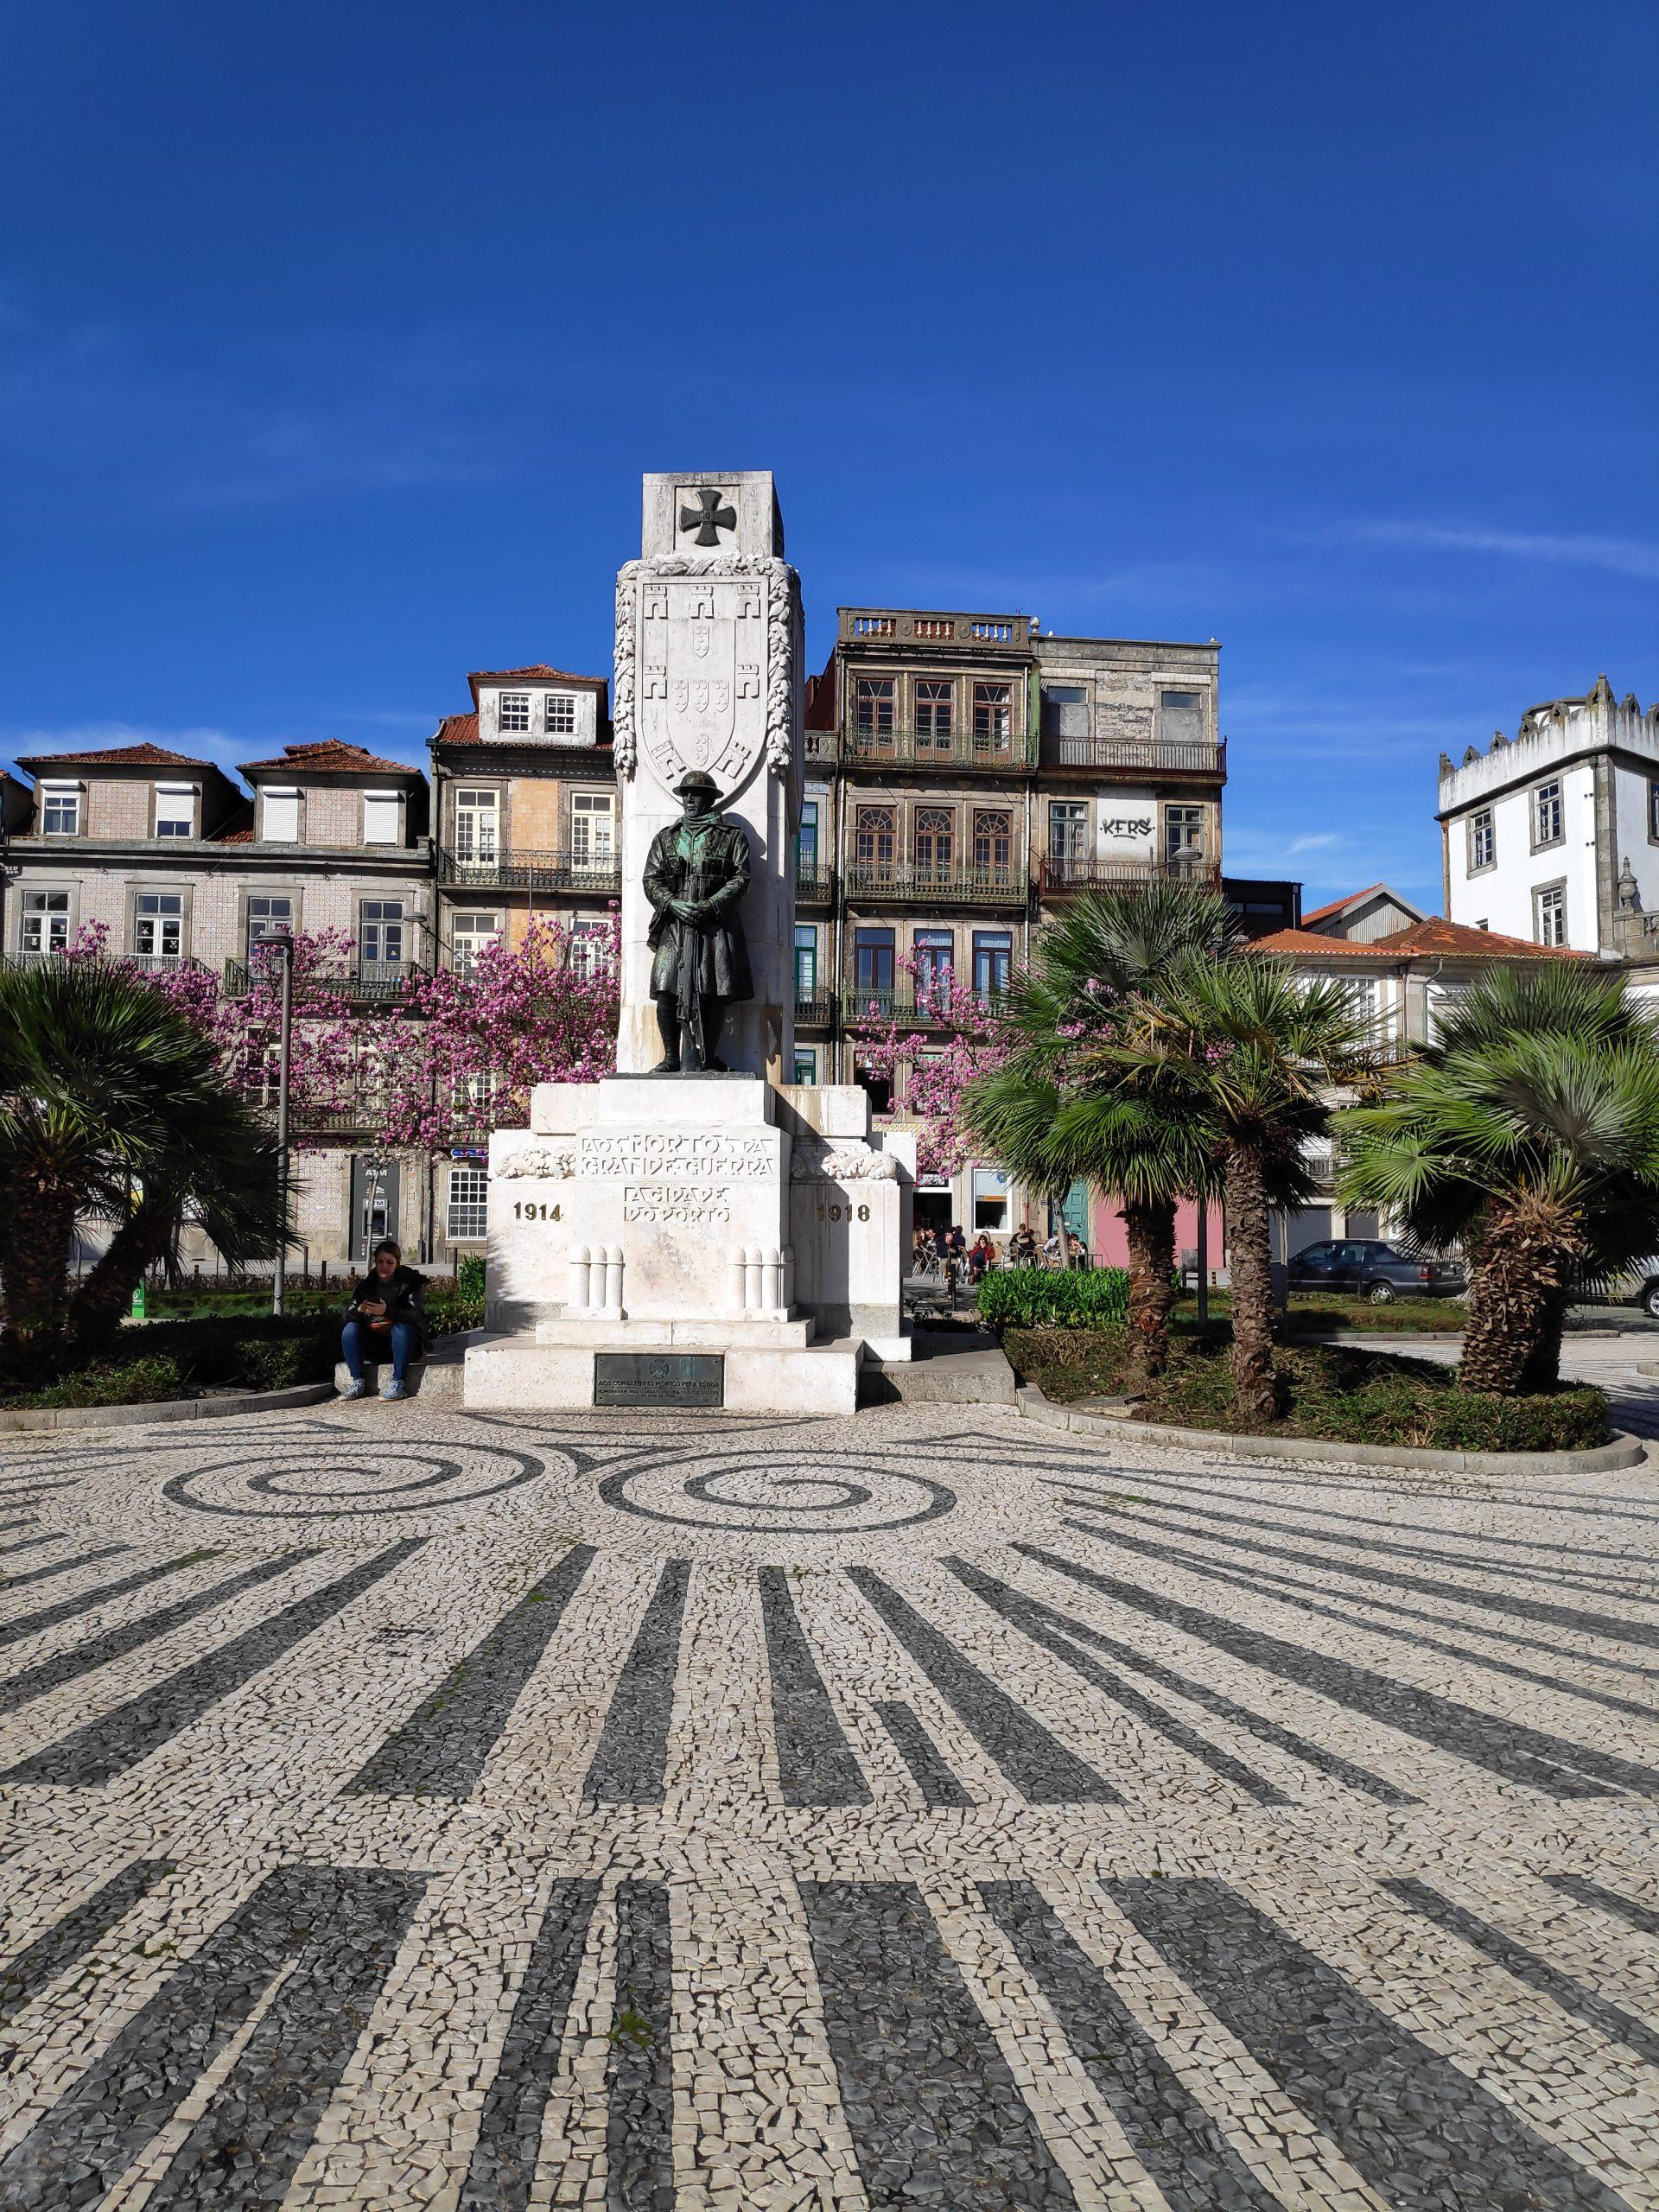 Memorial for WWI.